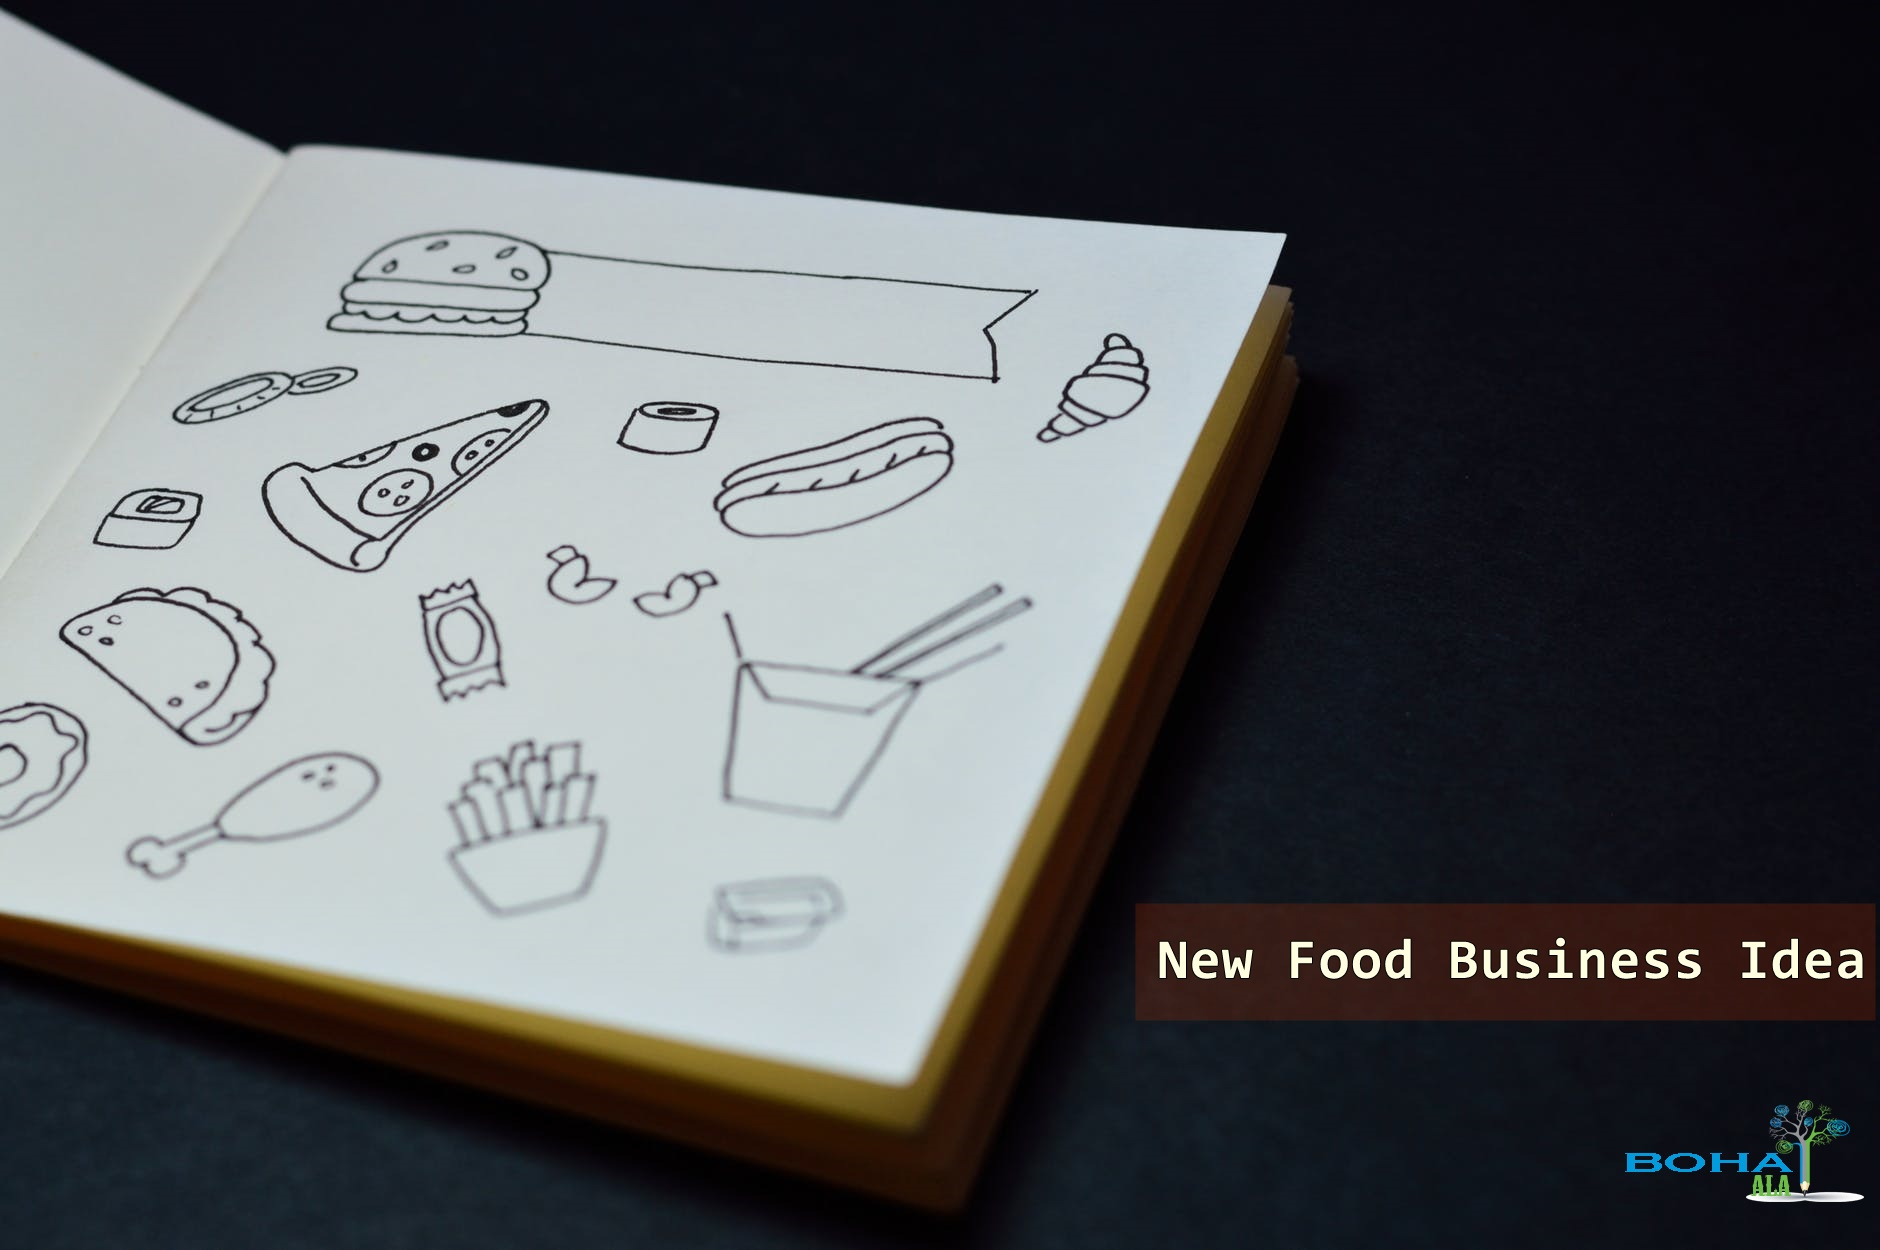 New Food Business Idea